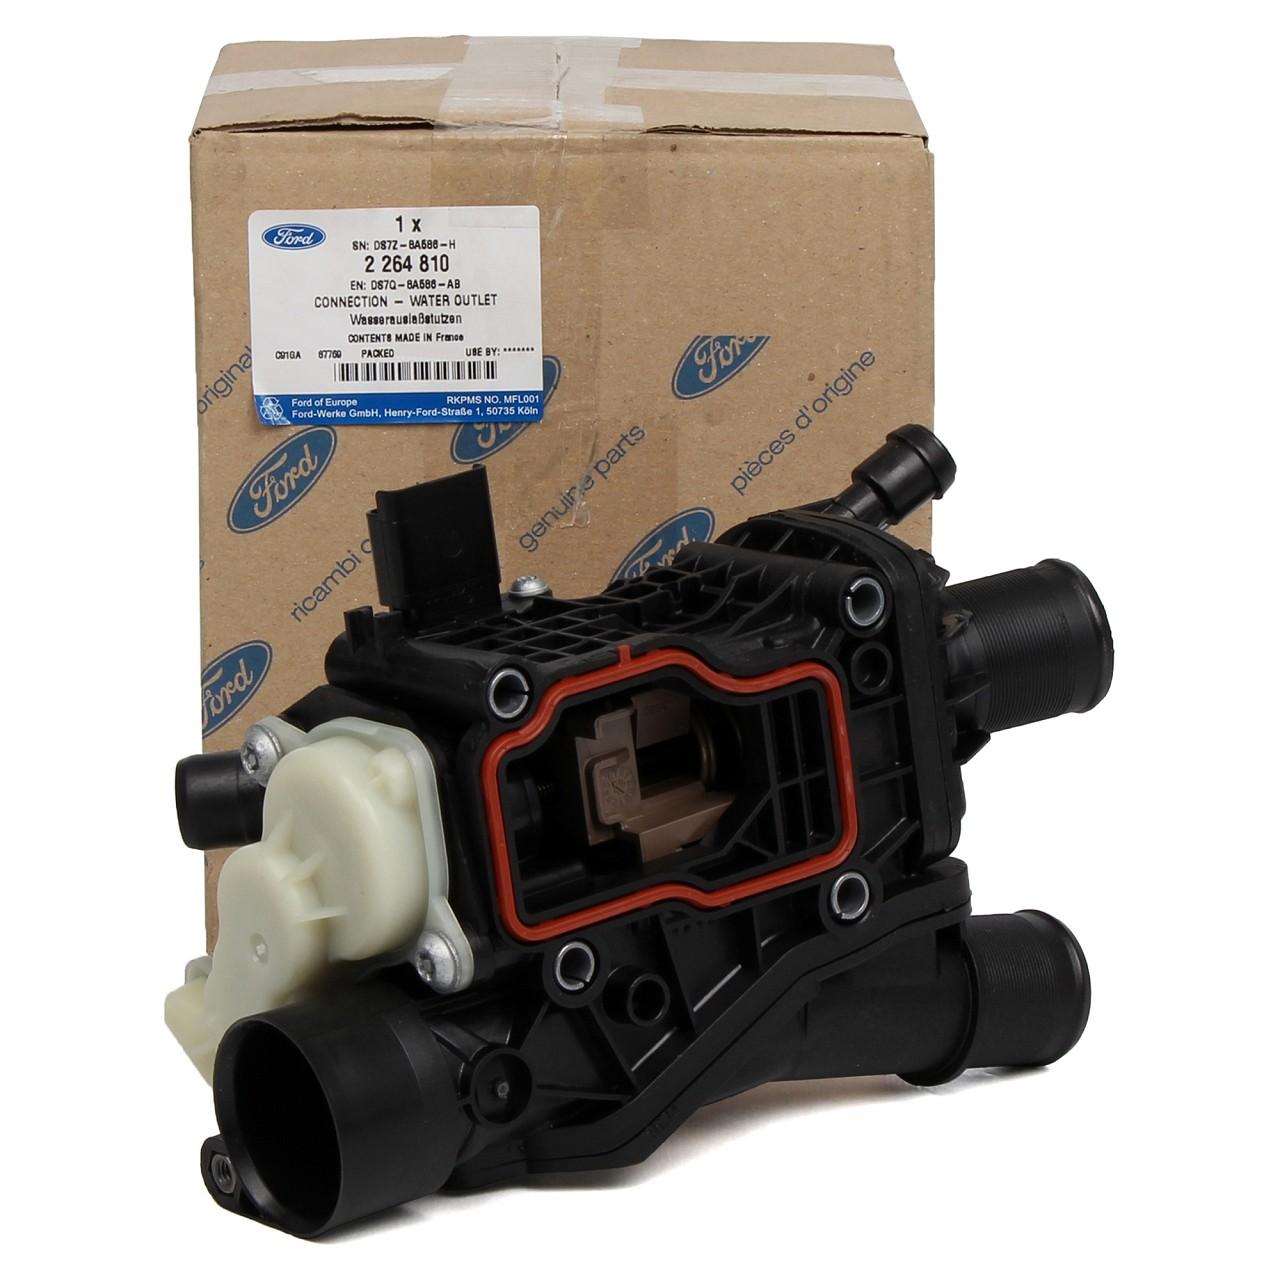 ORIGINAL Ford Thermostatgehäuse C-MAX II FOCUS III MONDEO V 2.0 TDCi 2264810